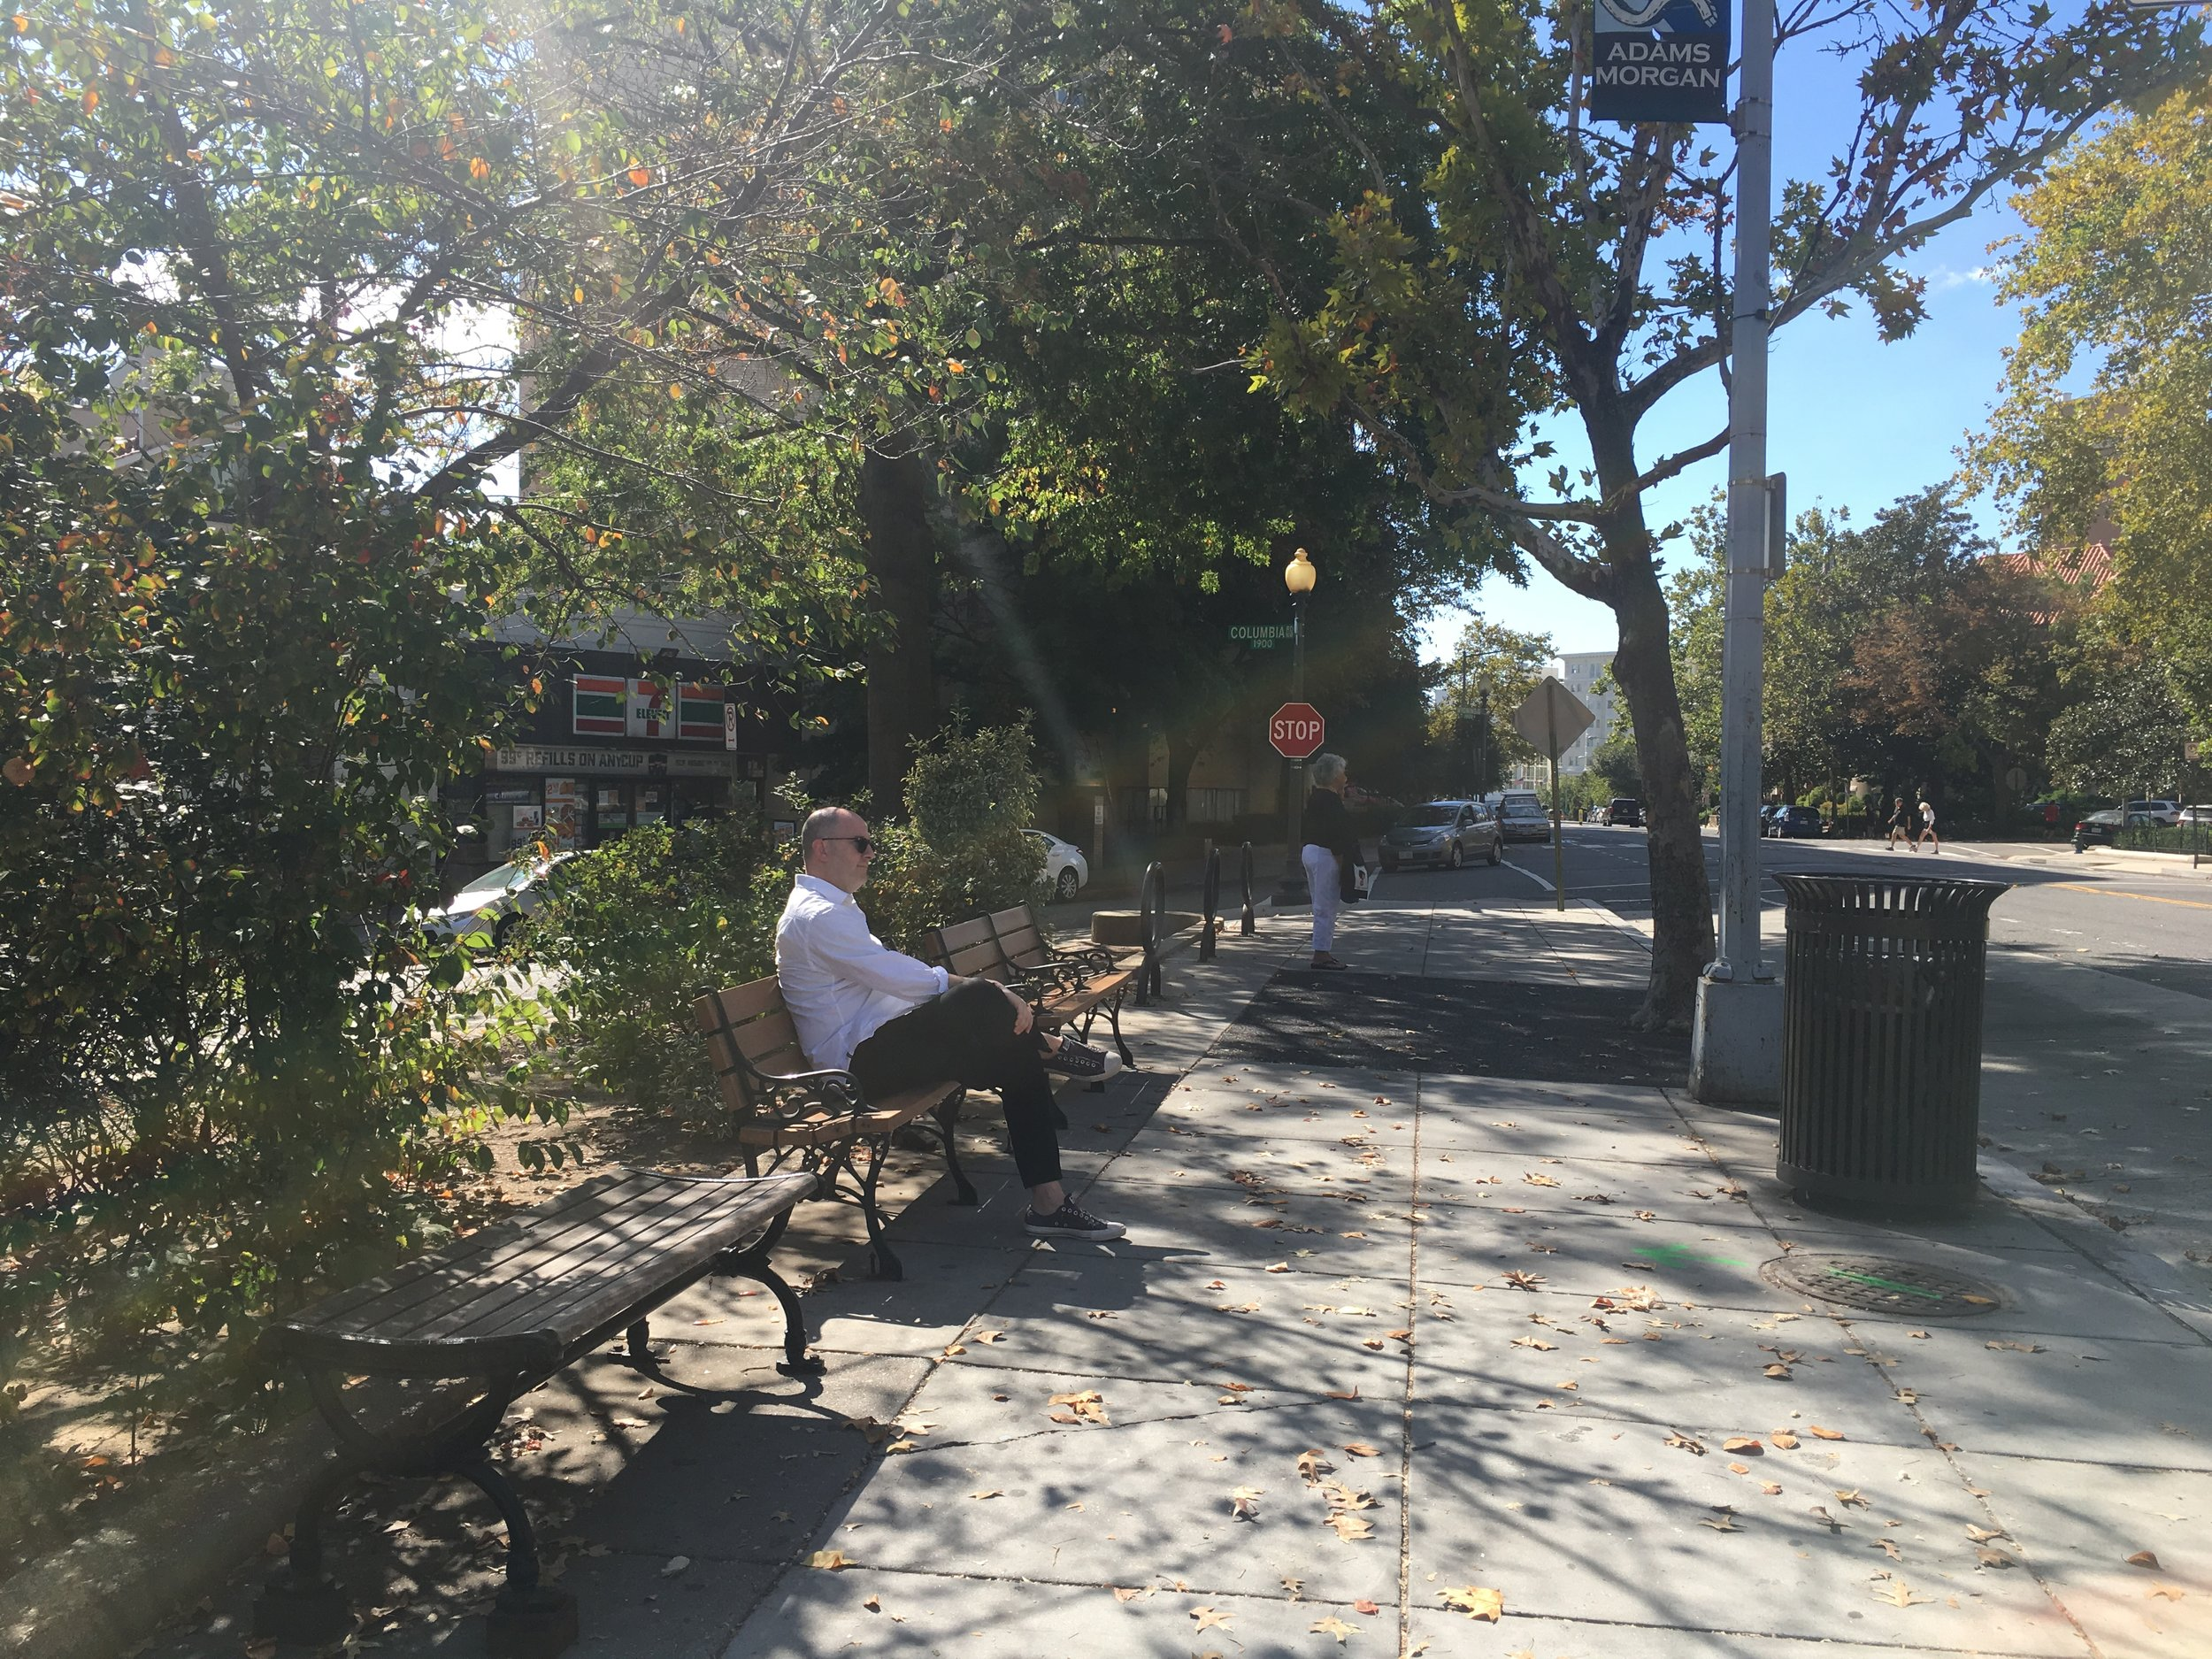 James Huckenpahler at the corner of 19th St NW & Columbia St NW in Adams Morgan, Washington, DC. October 2017; Digital image.